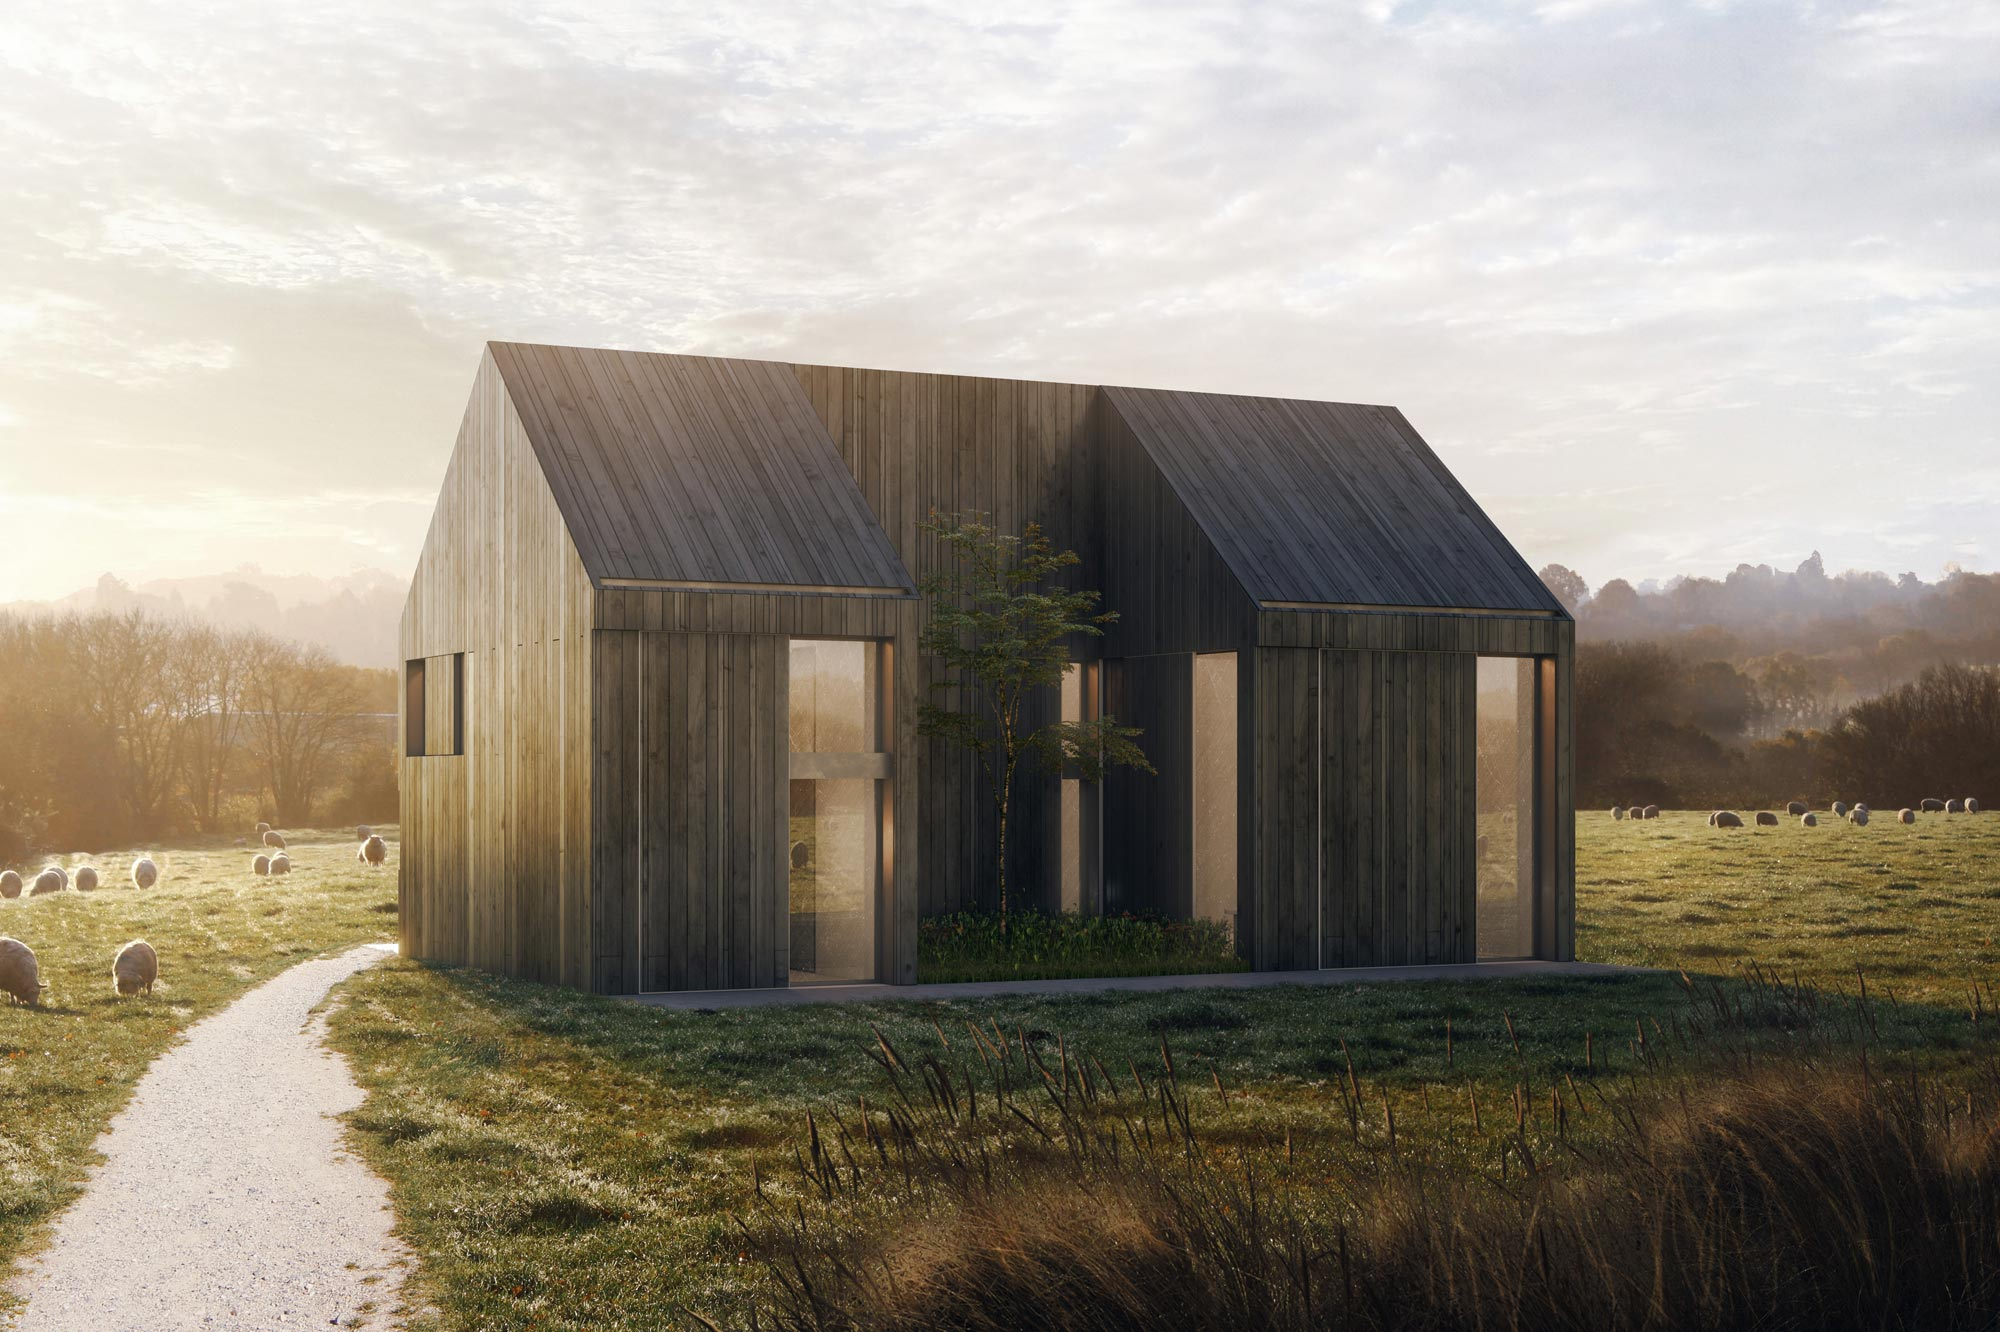 cube-haus-faye-toogood-architects-cs-2000px-01